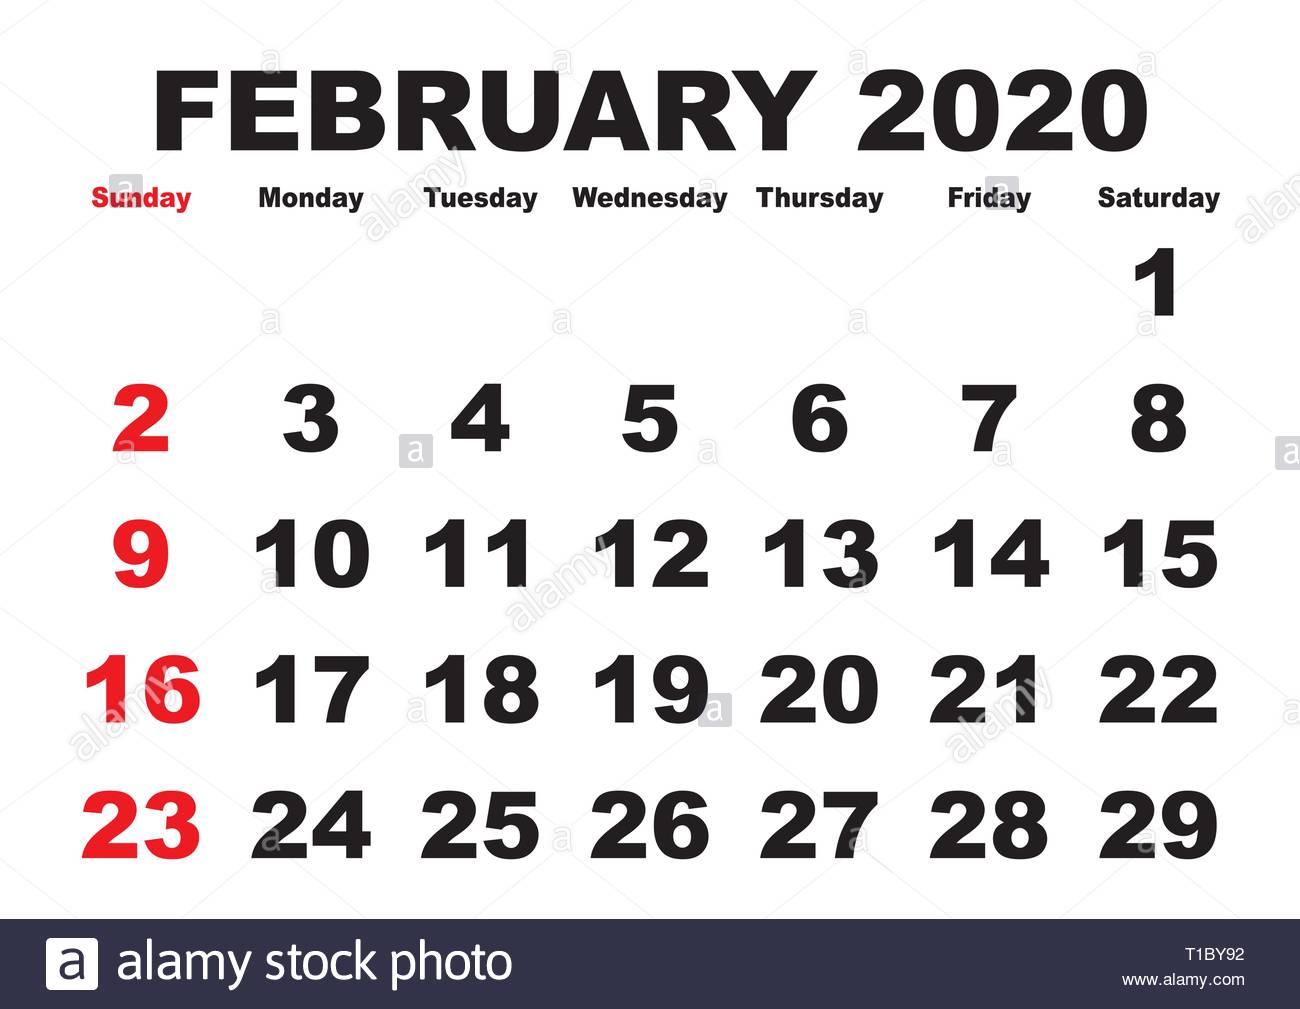 Calendario Lunar Febrero 2020.Scheduler Imagenes De Stock Scheduler Fotos De Stock Alamy